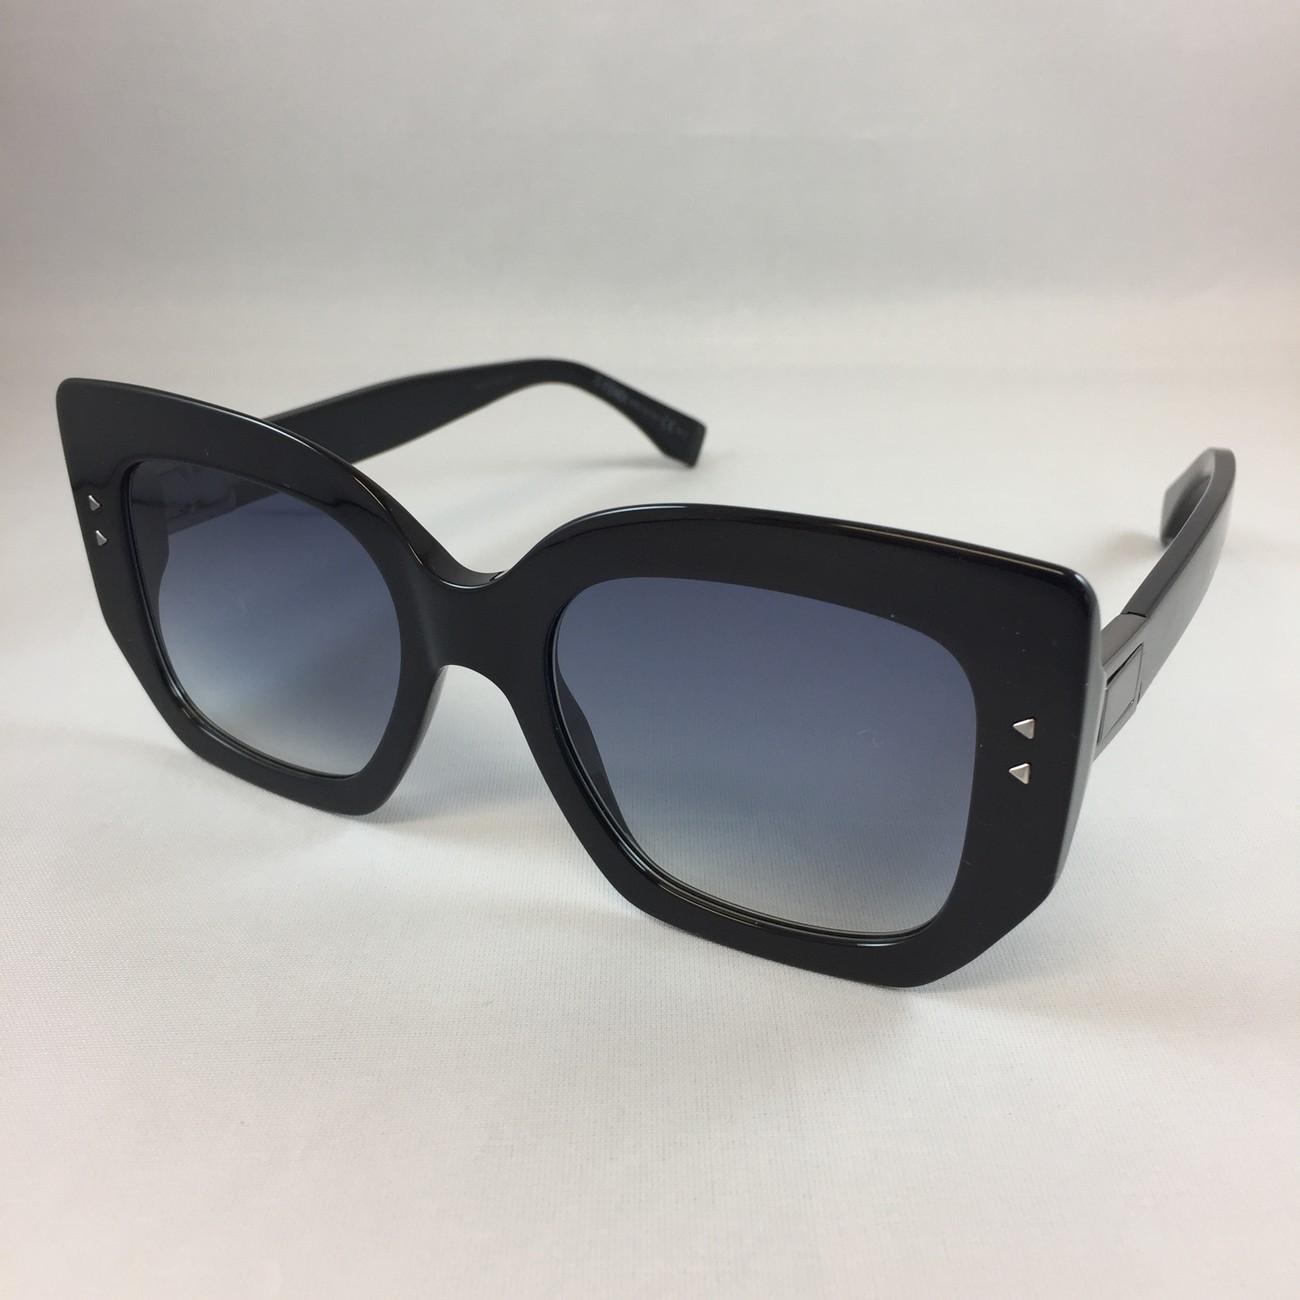 Fendi FF 0267/S 807 black